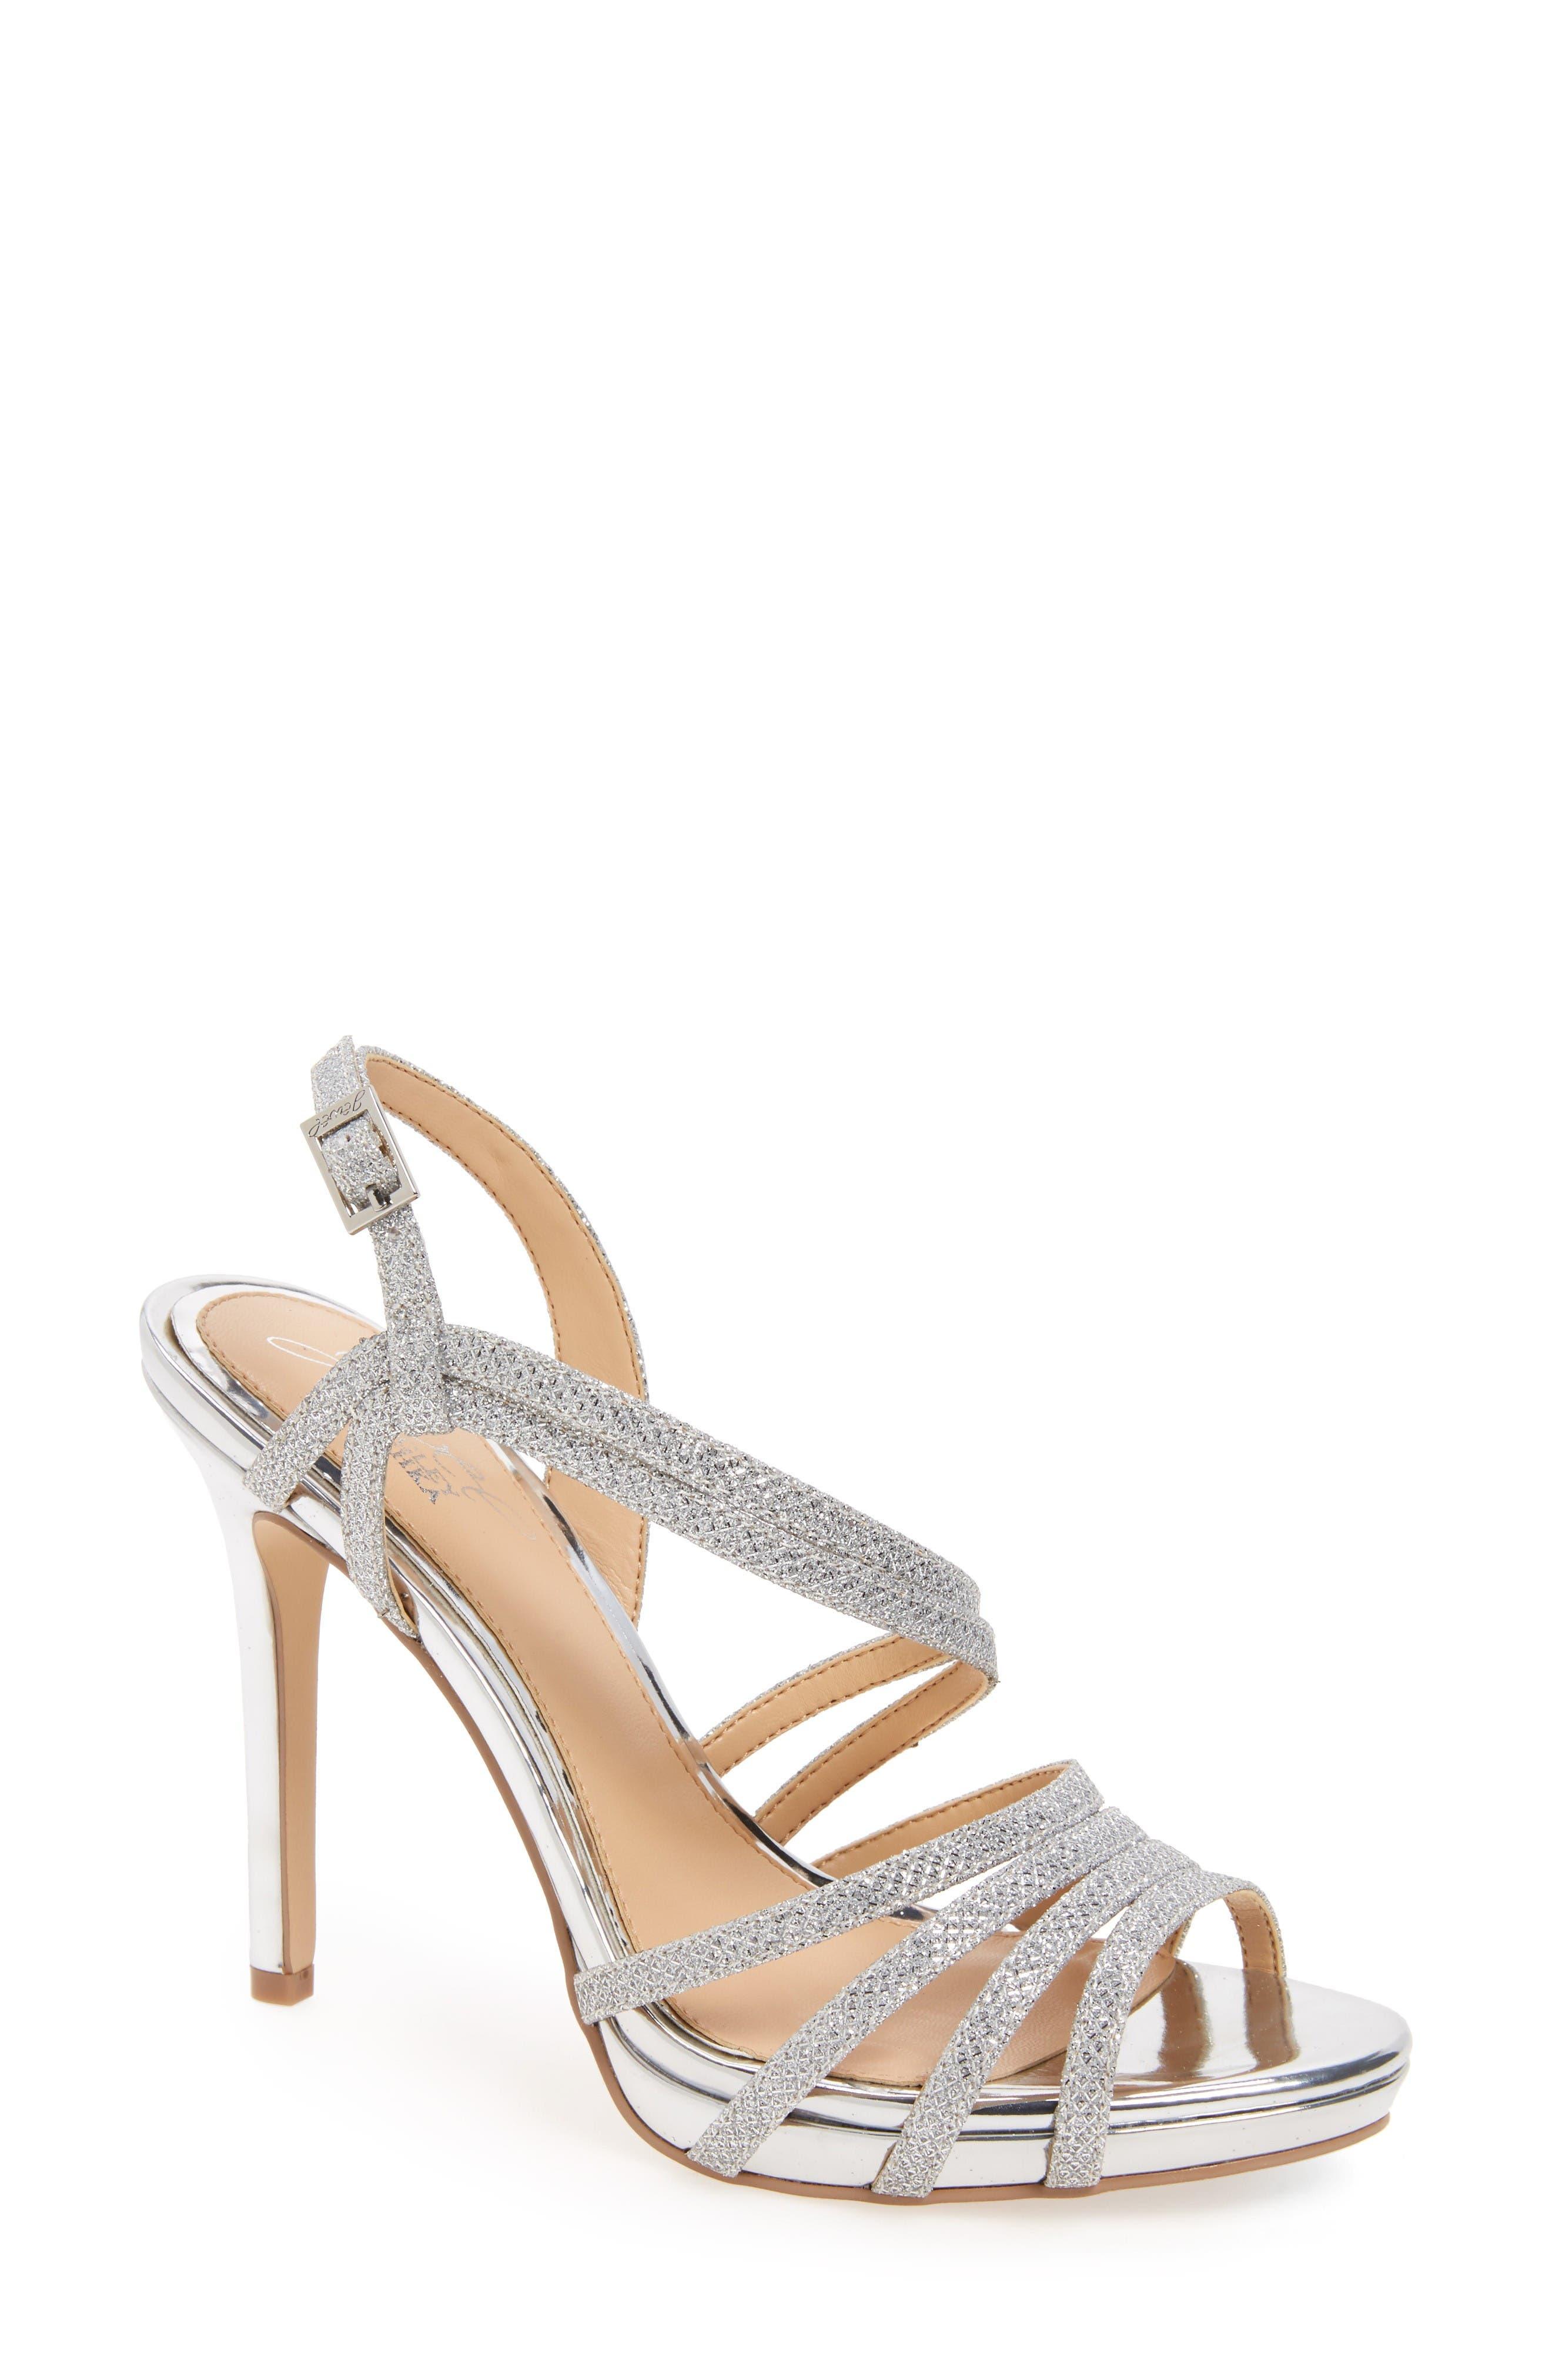 Alternate Image 1 Selected - Jewel Badgley Mischka Humble Strappy Sandal (Women)